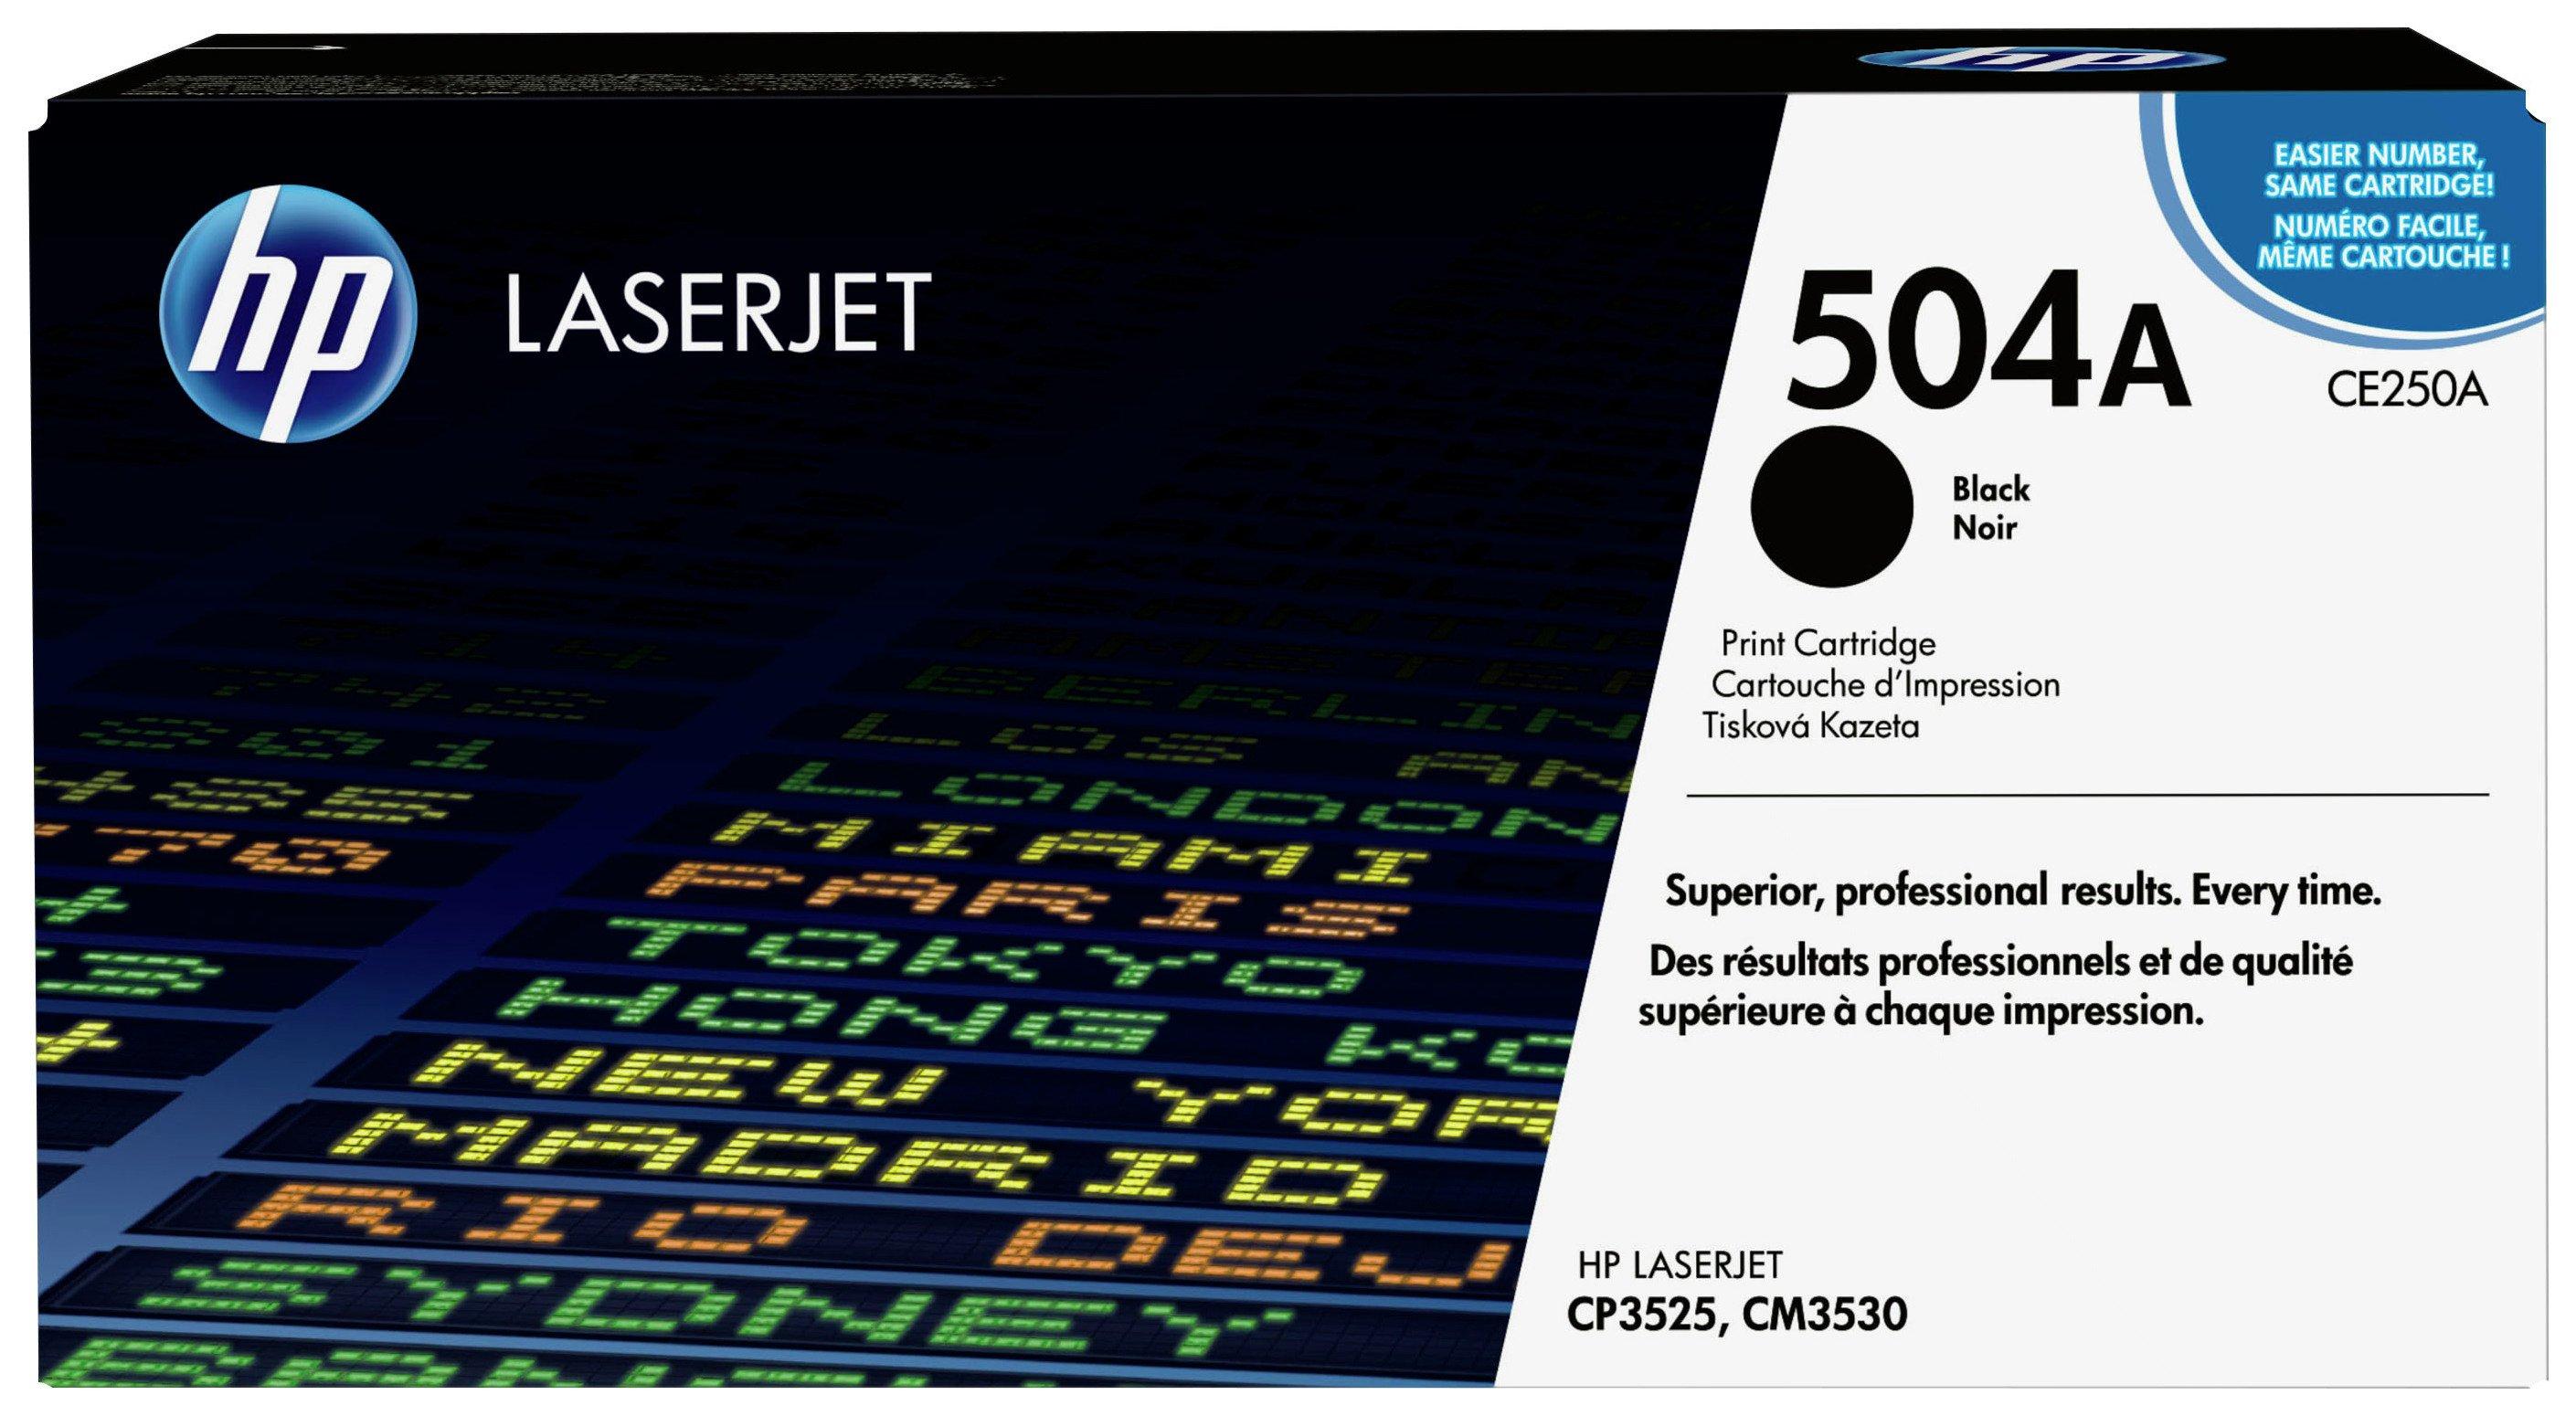 HP - 504A Black LaserJet - Toner Cartridge (CE250A)